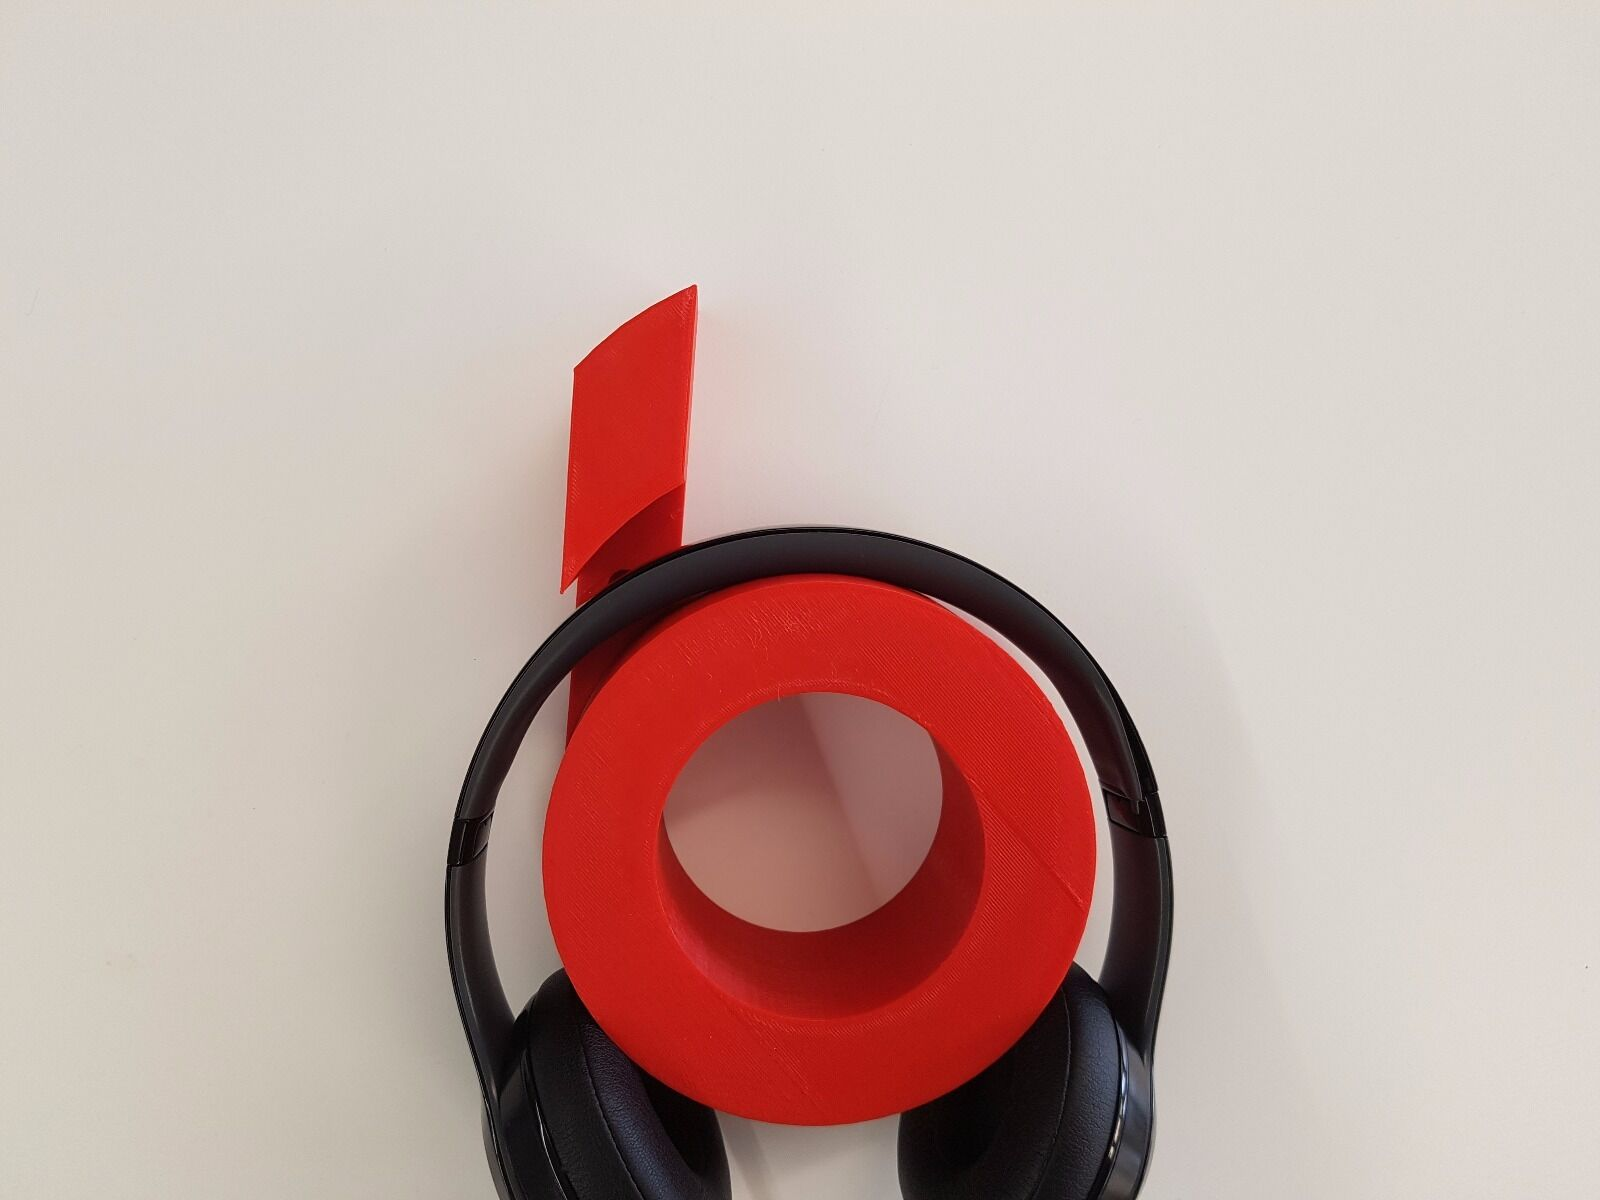 Beats headphone stand/wall mount